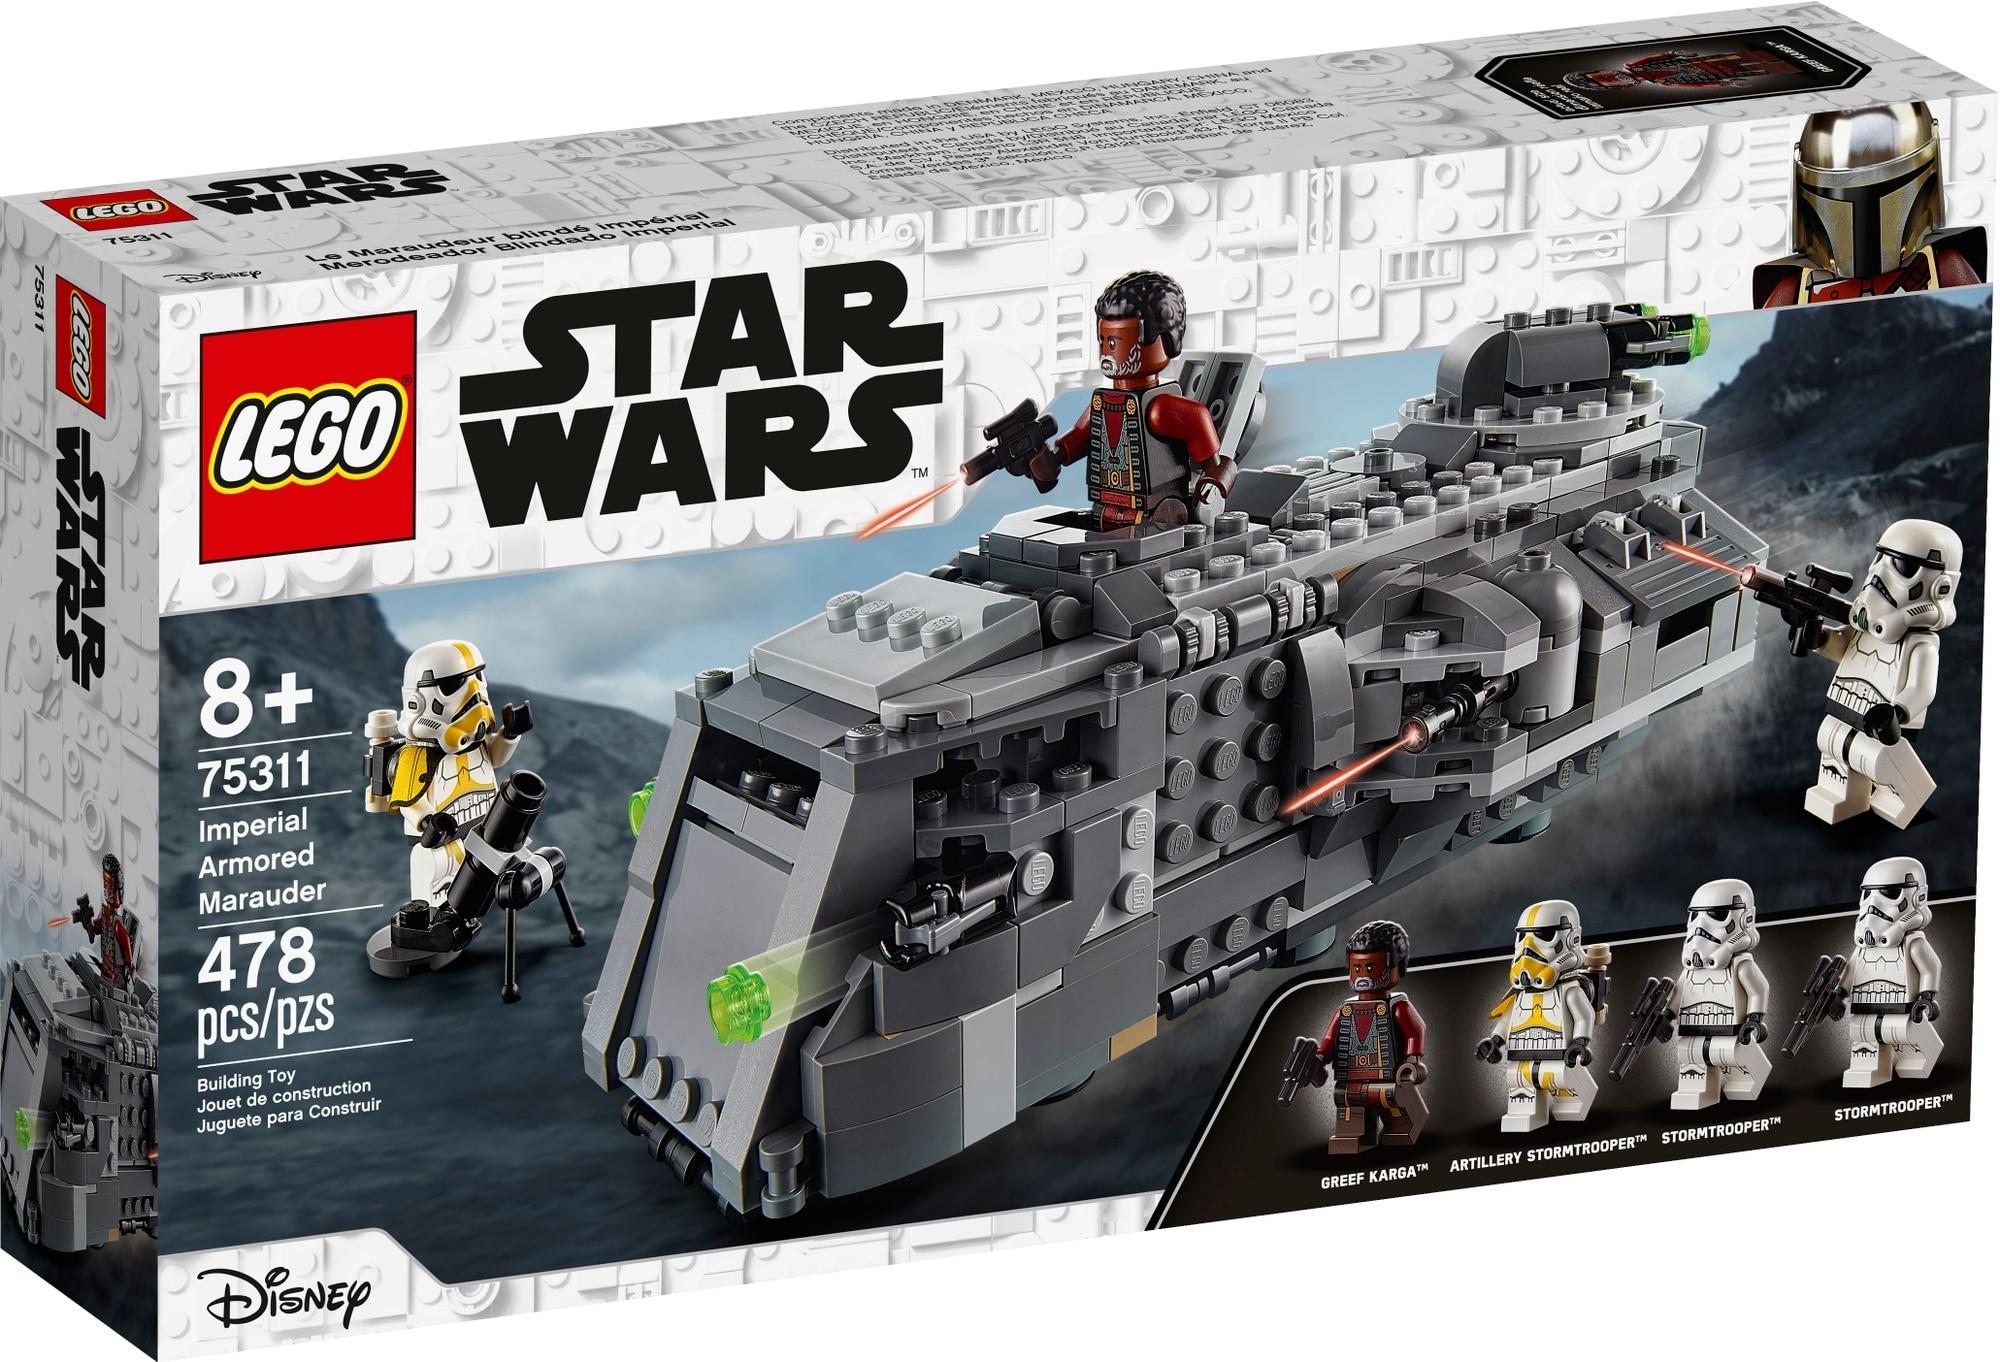 LEGO Star Wars 75311 Imperialer Marauder 2